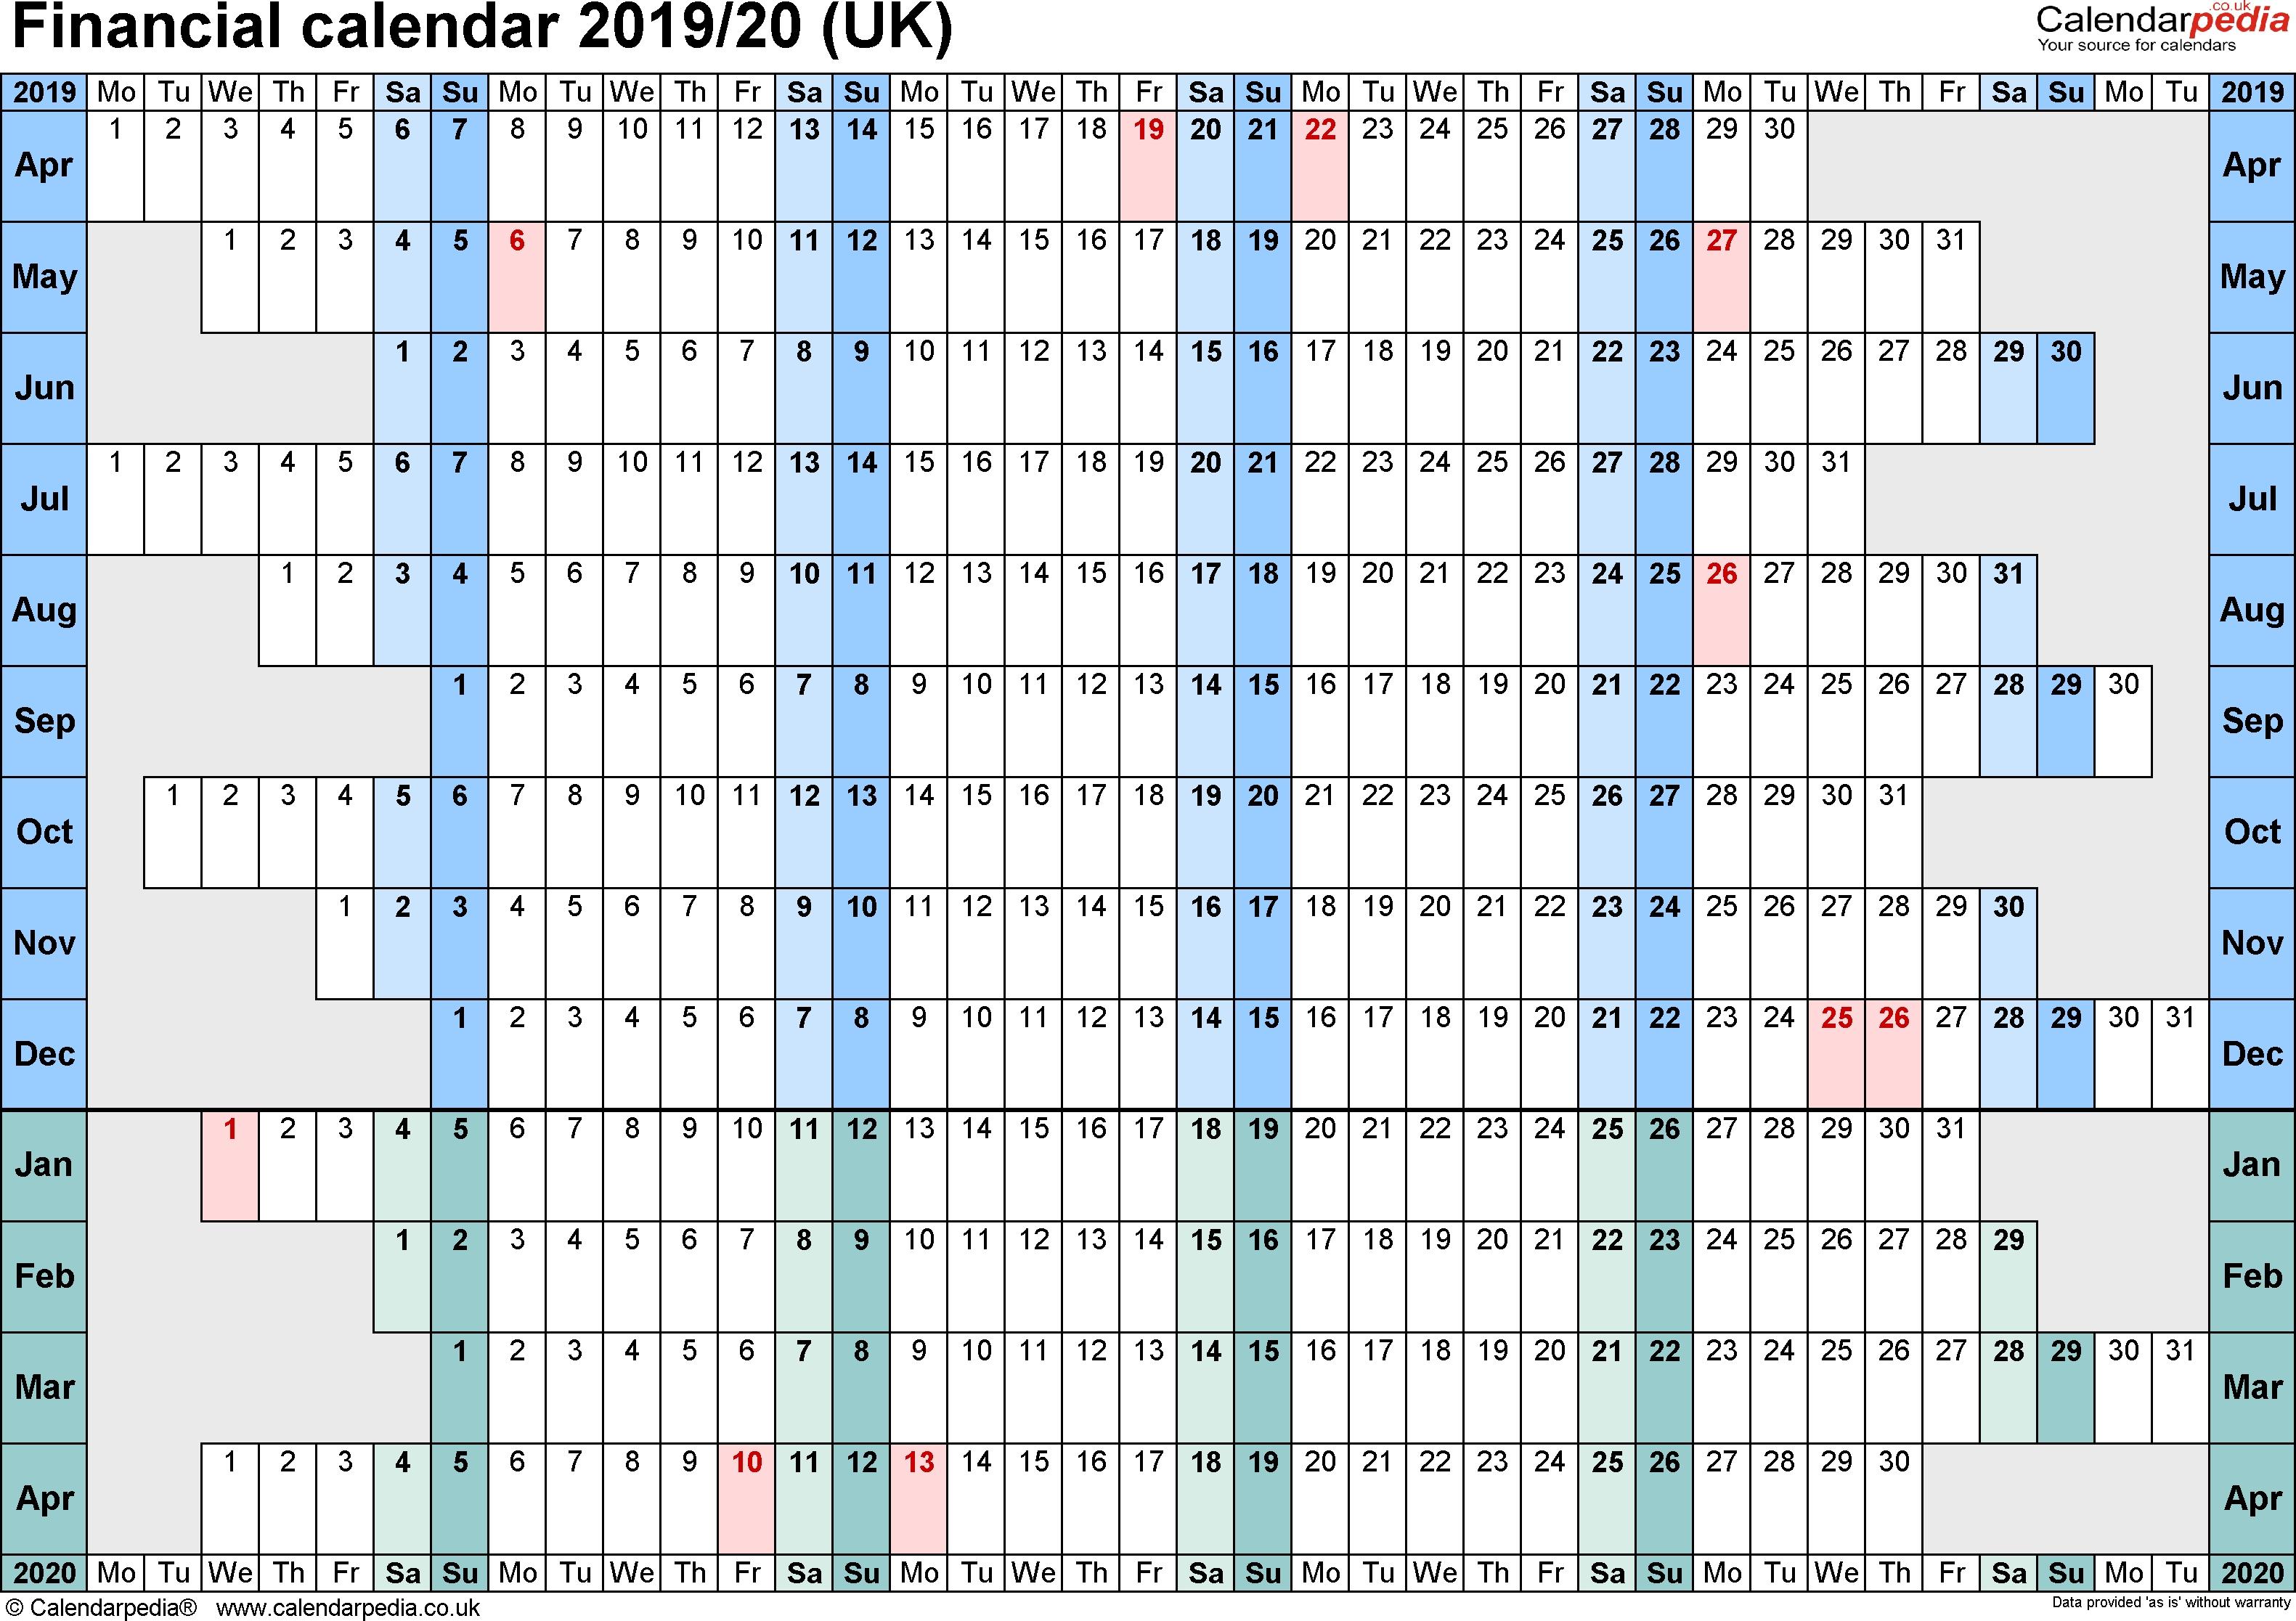 Financial Calendars 2019/20 (Uk) In Pdf Format pertaining to Hmrc Paye Calendar 2019/2020